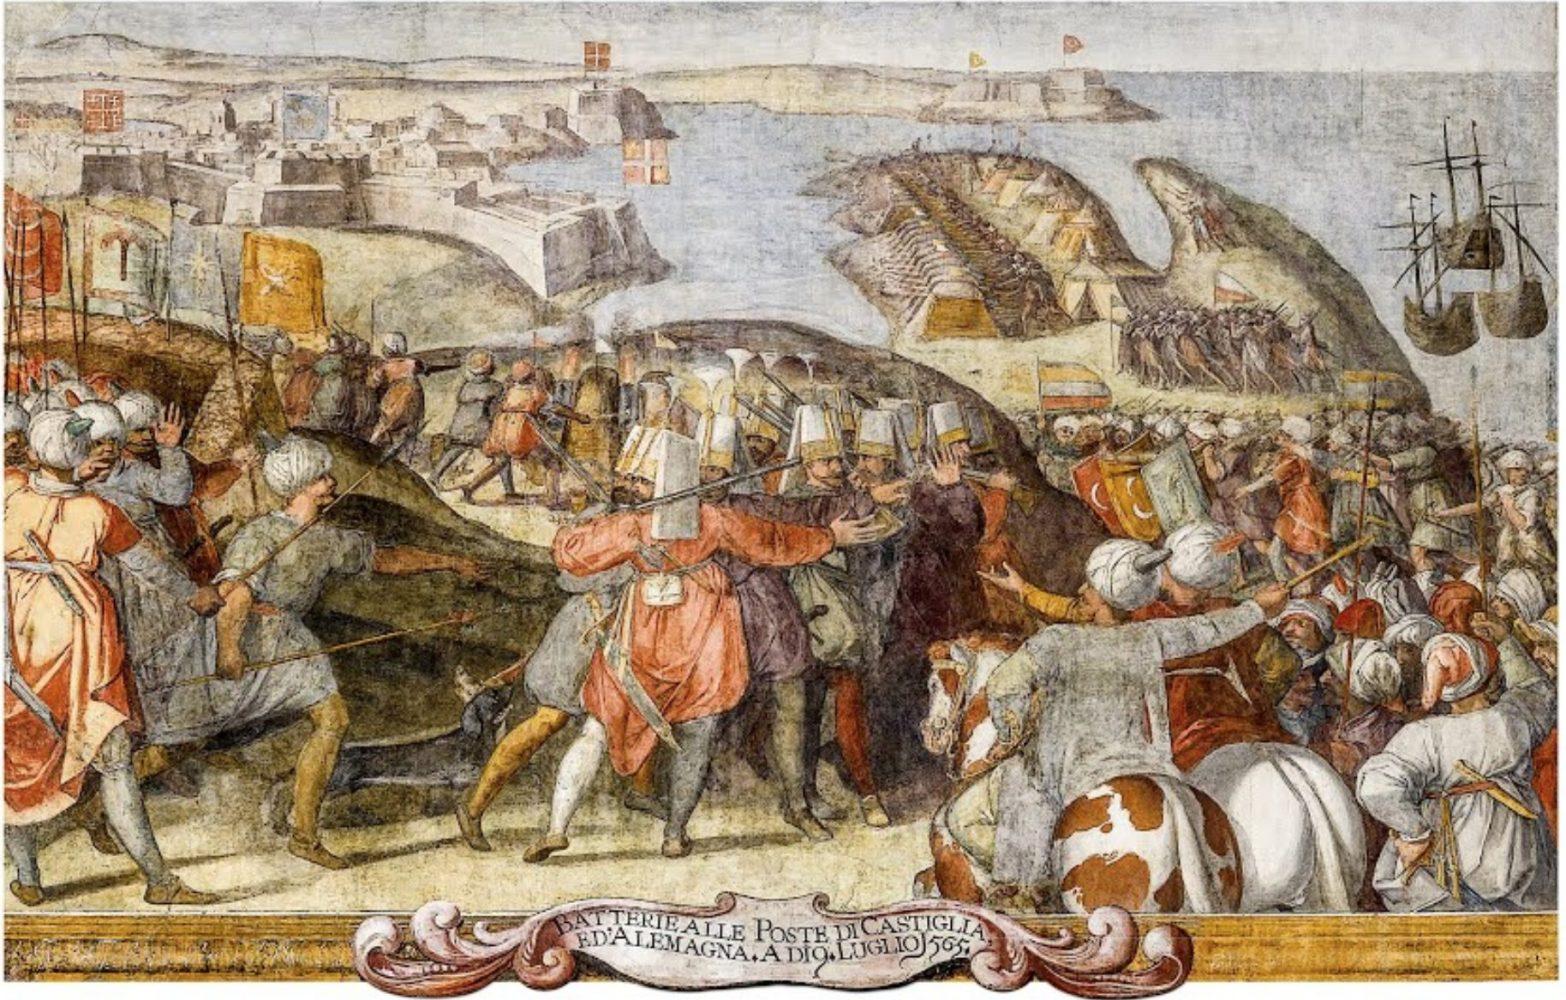 Осада Мальты в 1566 году (фреска Mattia Perez d'Aleccio).